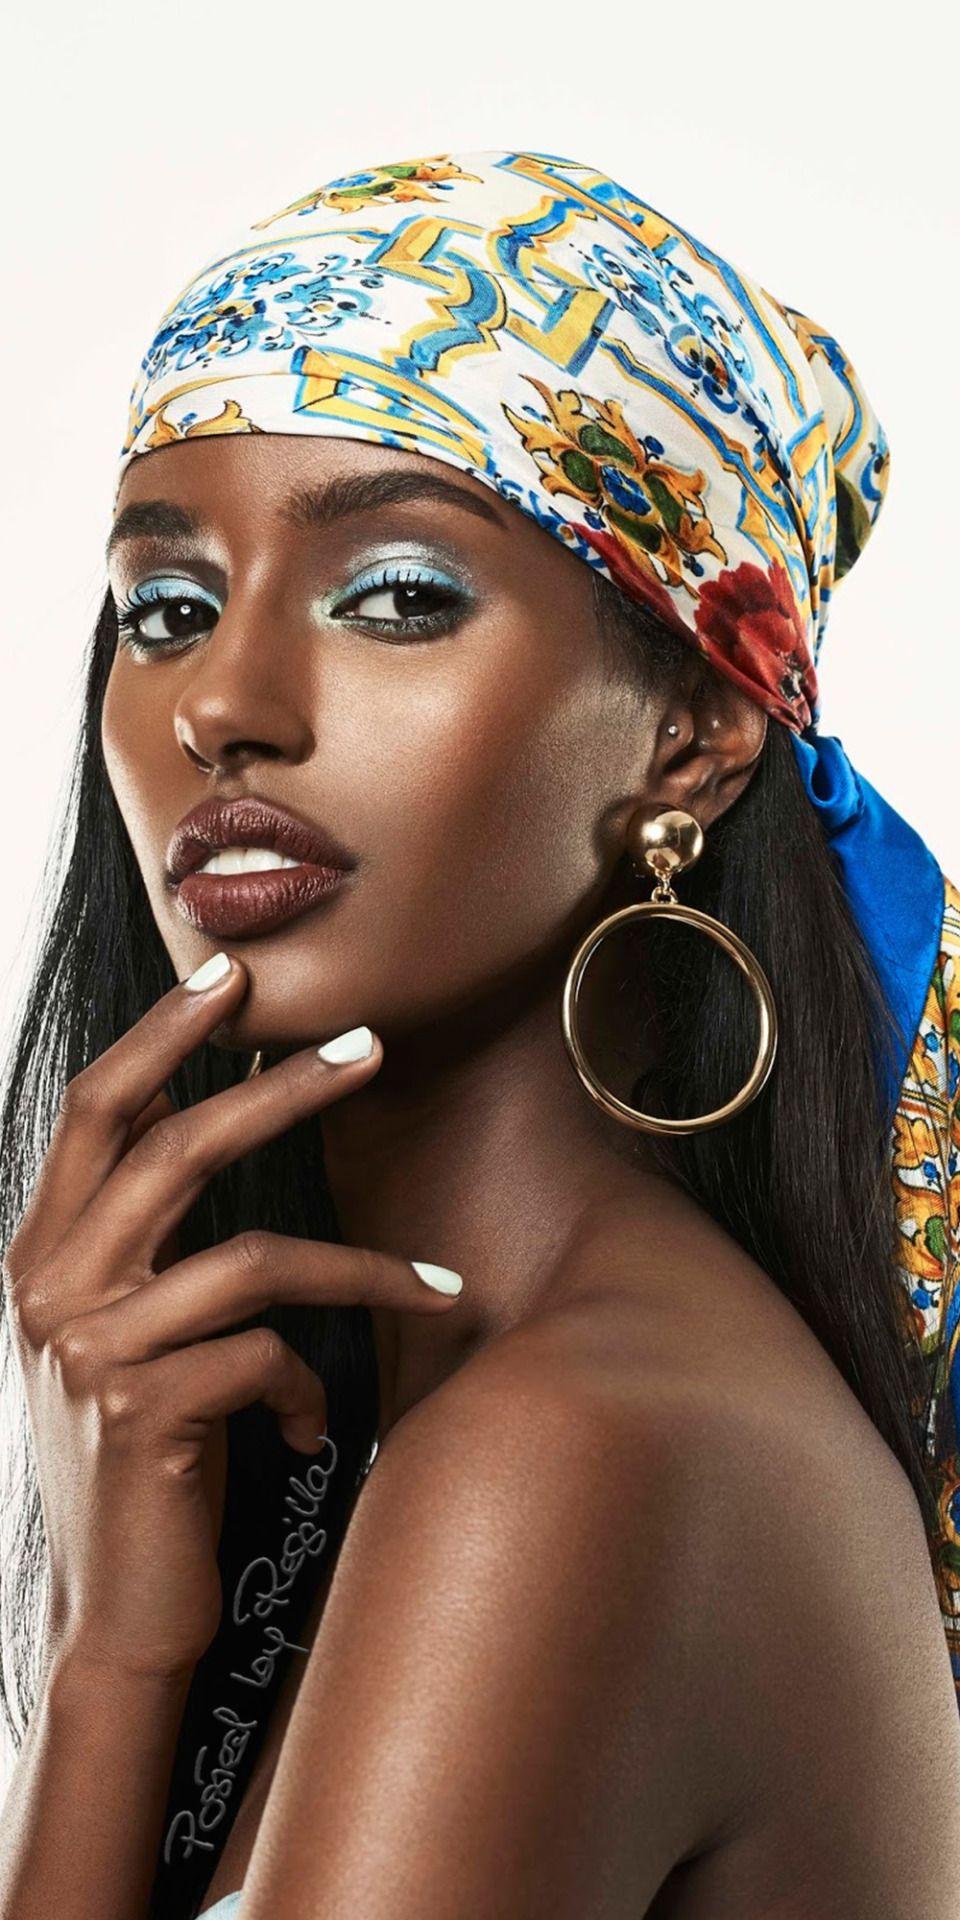 How to wear blue eyeshadow ? #Senaitgidey #blackwomen #blackmodel #maquillagepeauxnoiresetmetissees #headwrap #scarf #berrylips